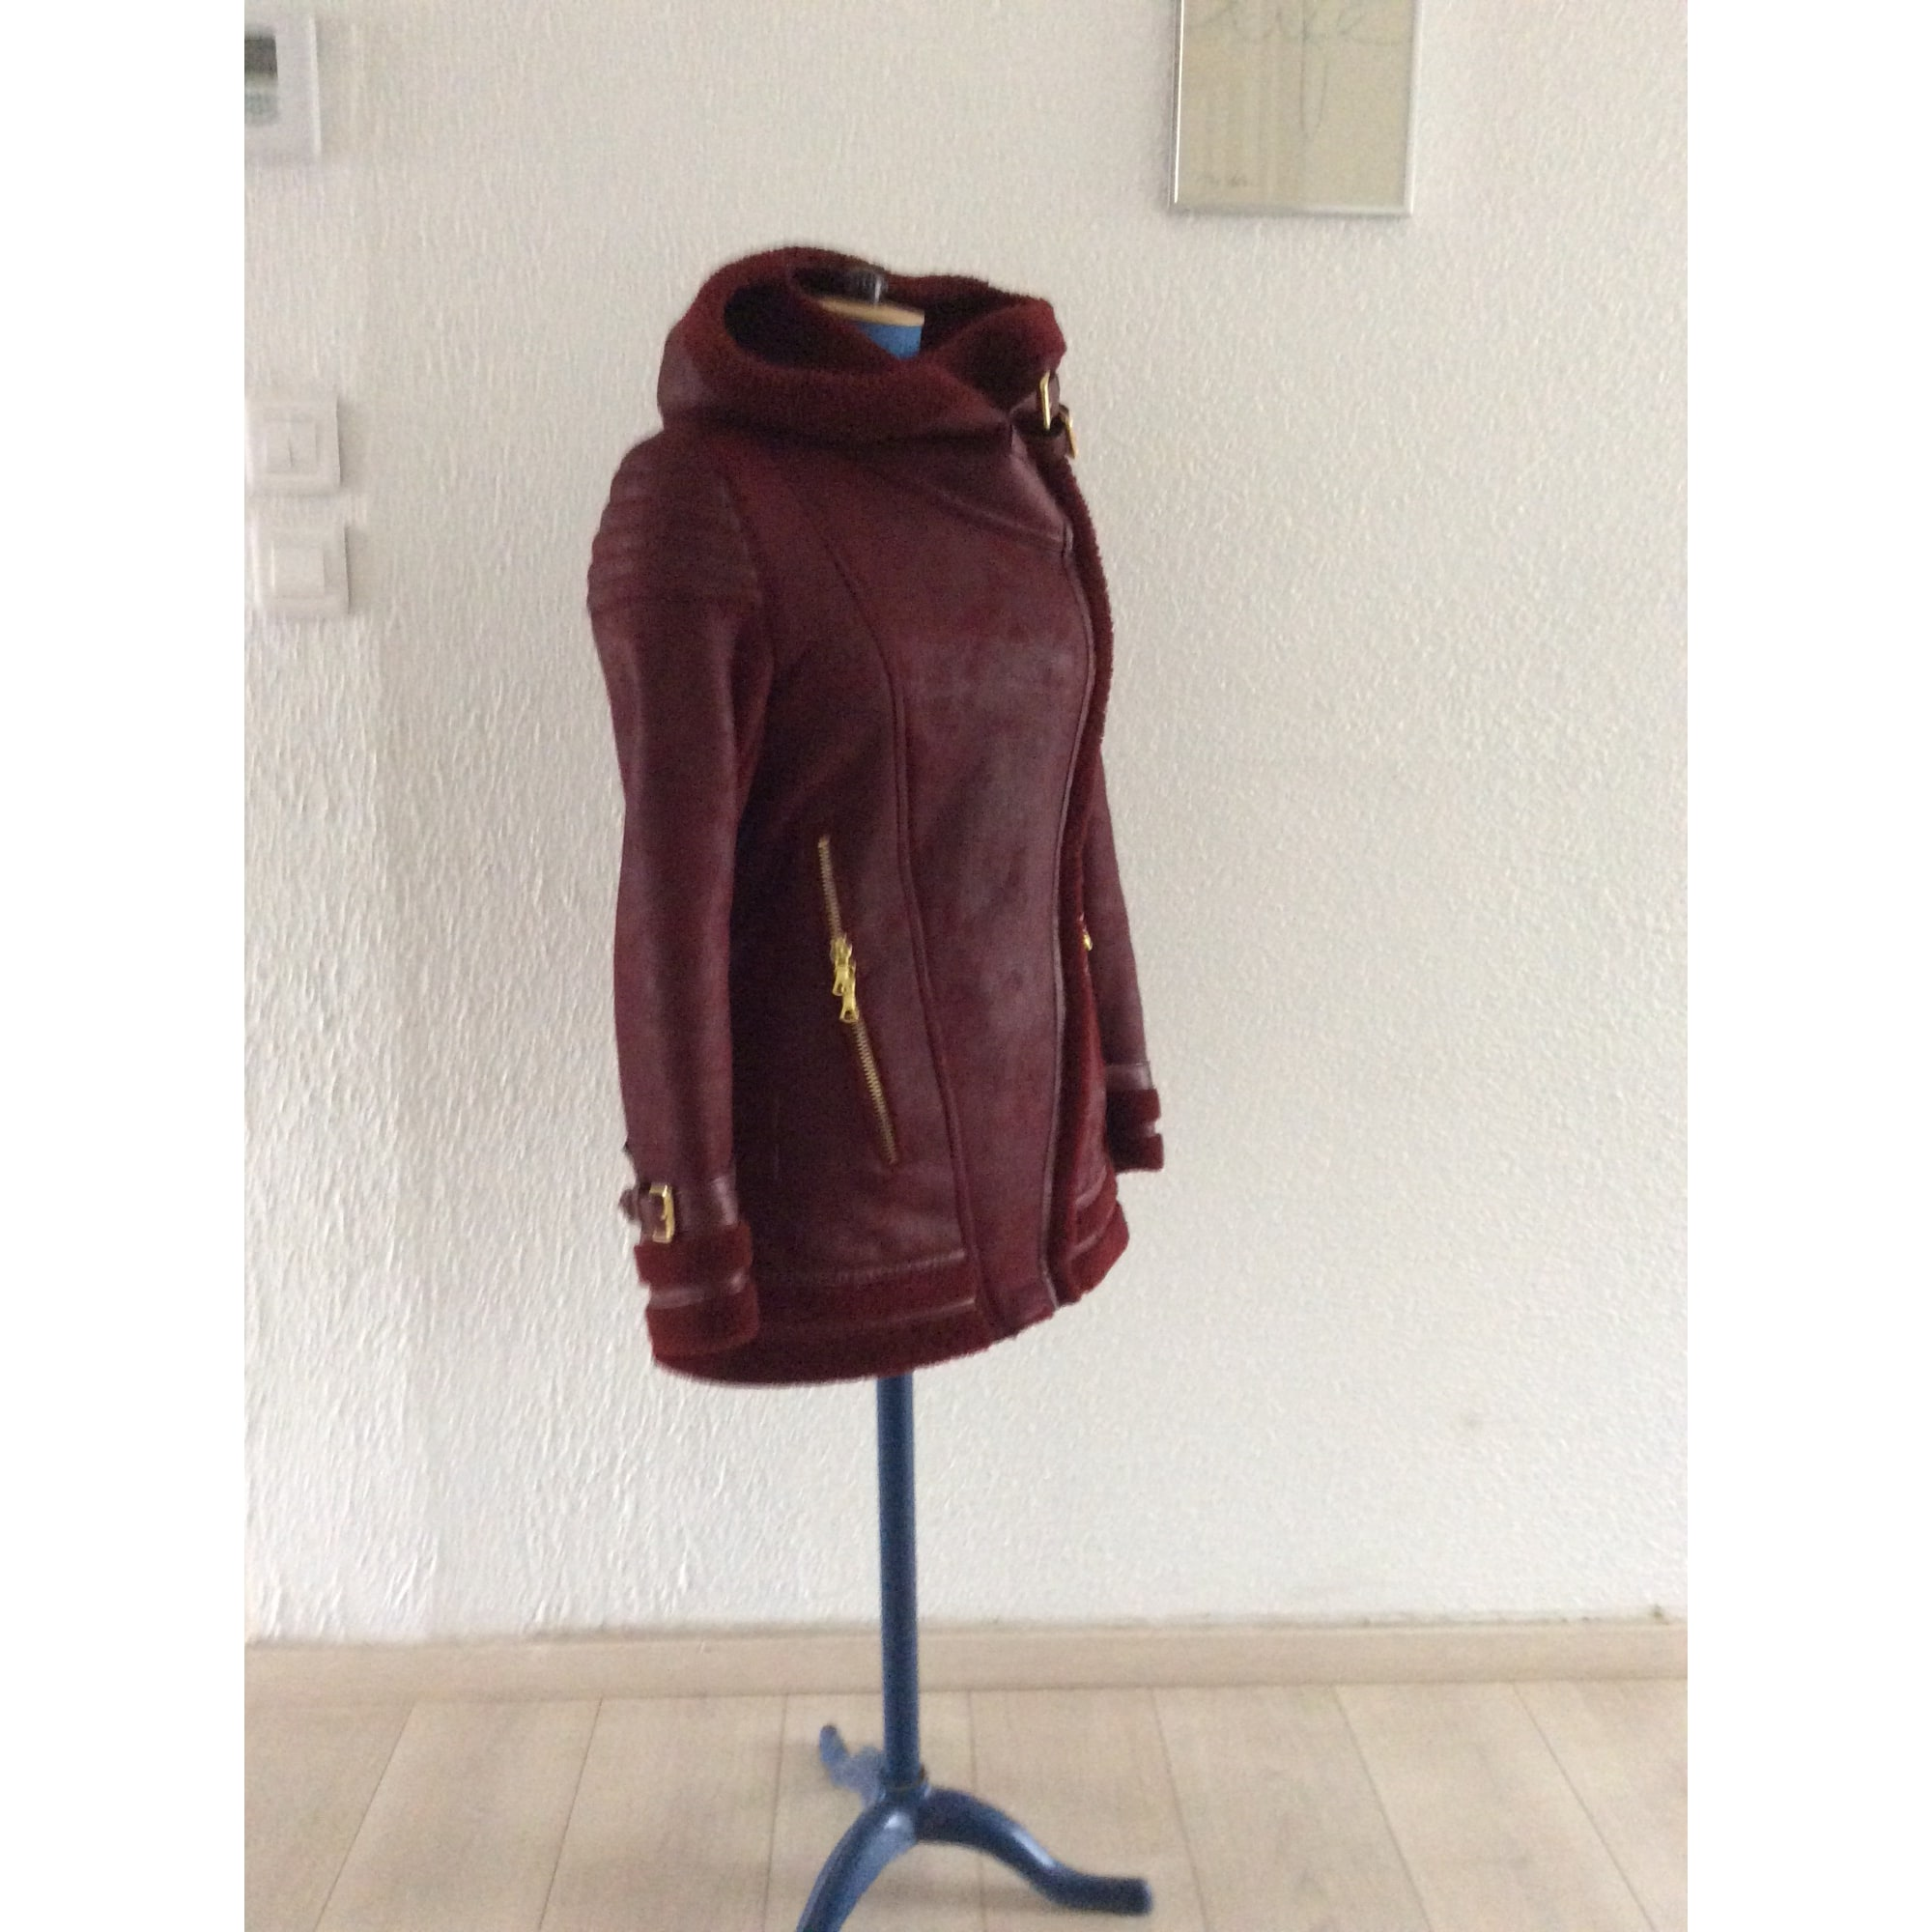 Blouson, veste en fourrure FOURRURE GIORGIO Rouge, bordeaux